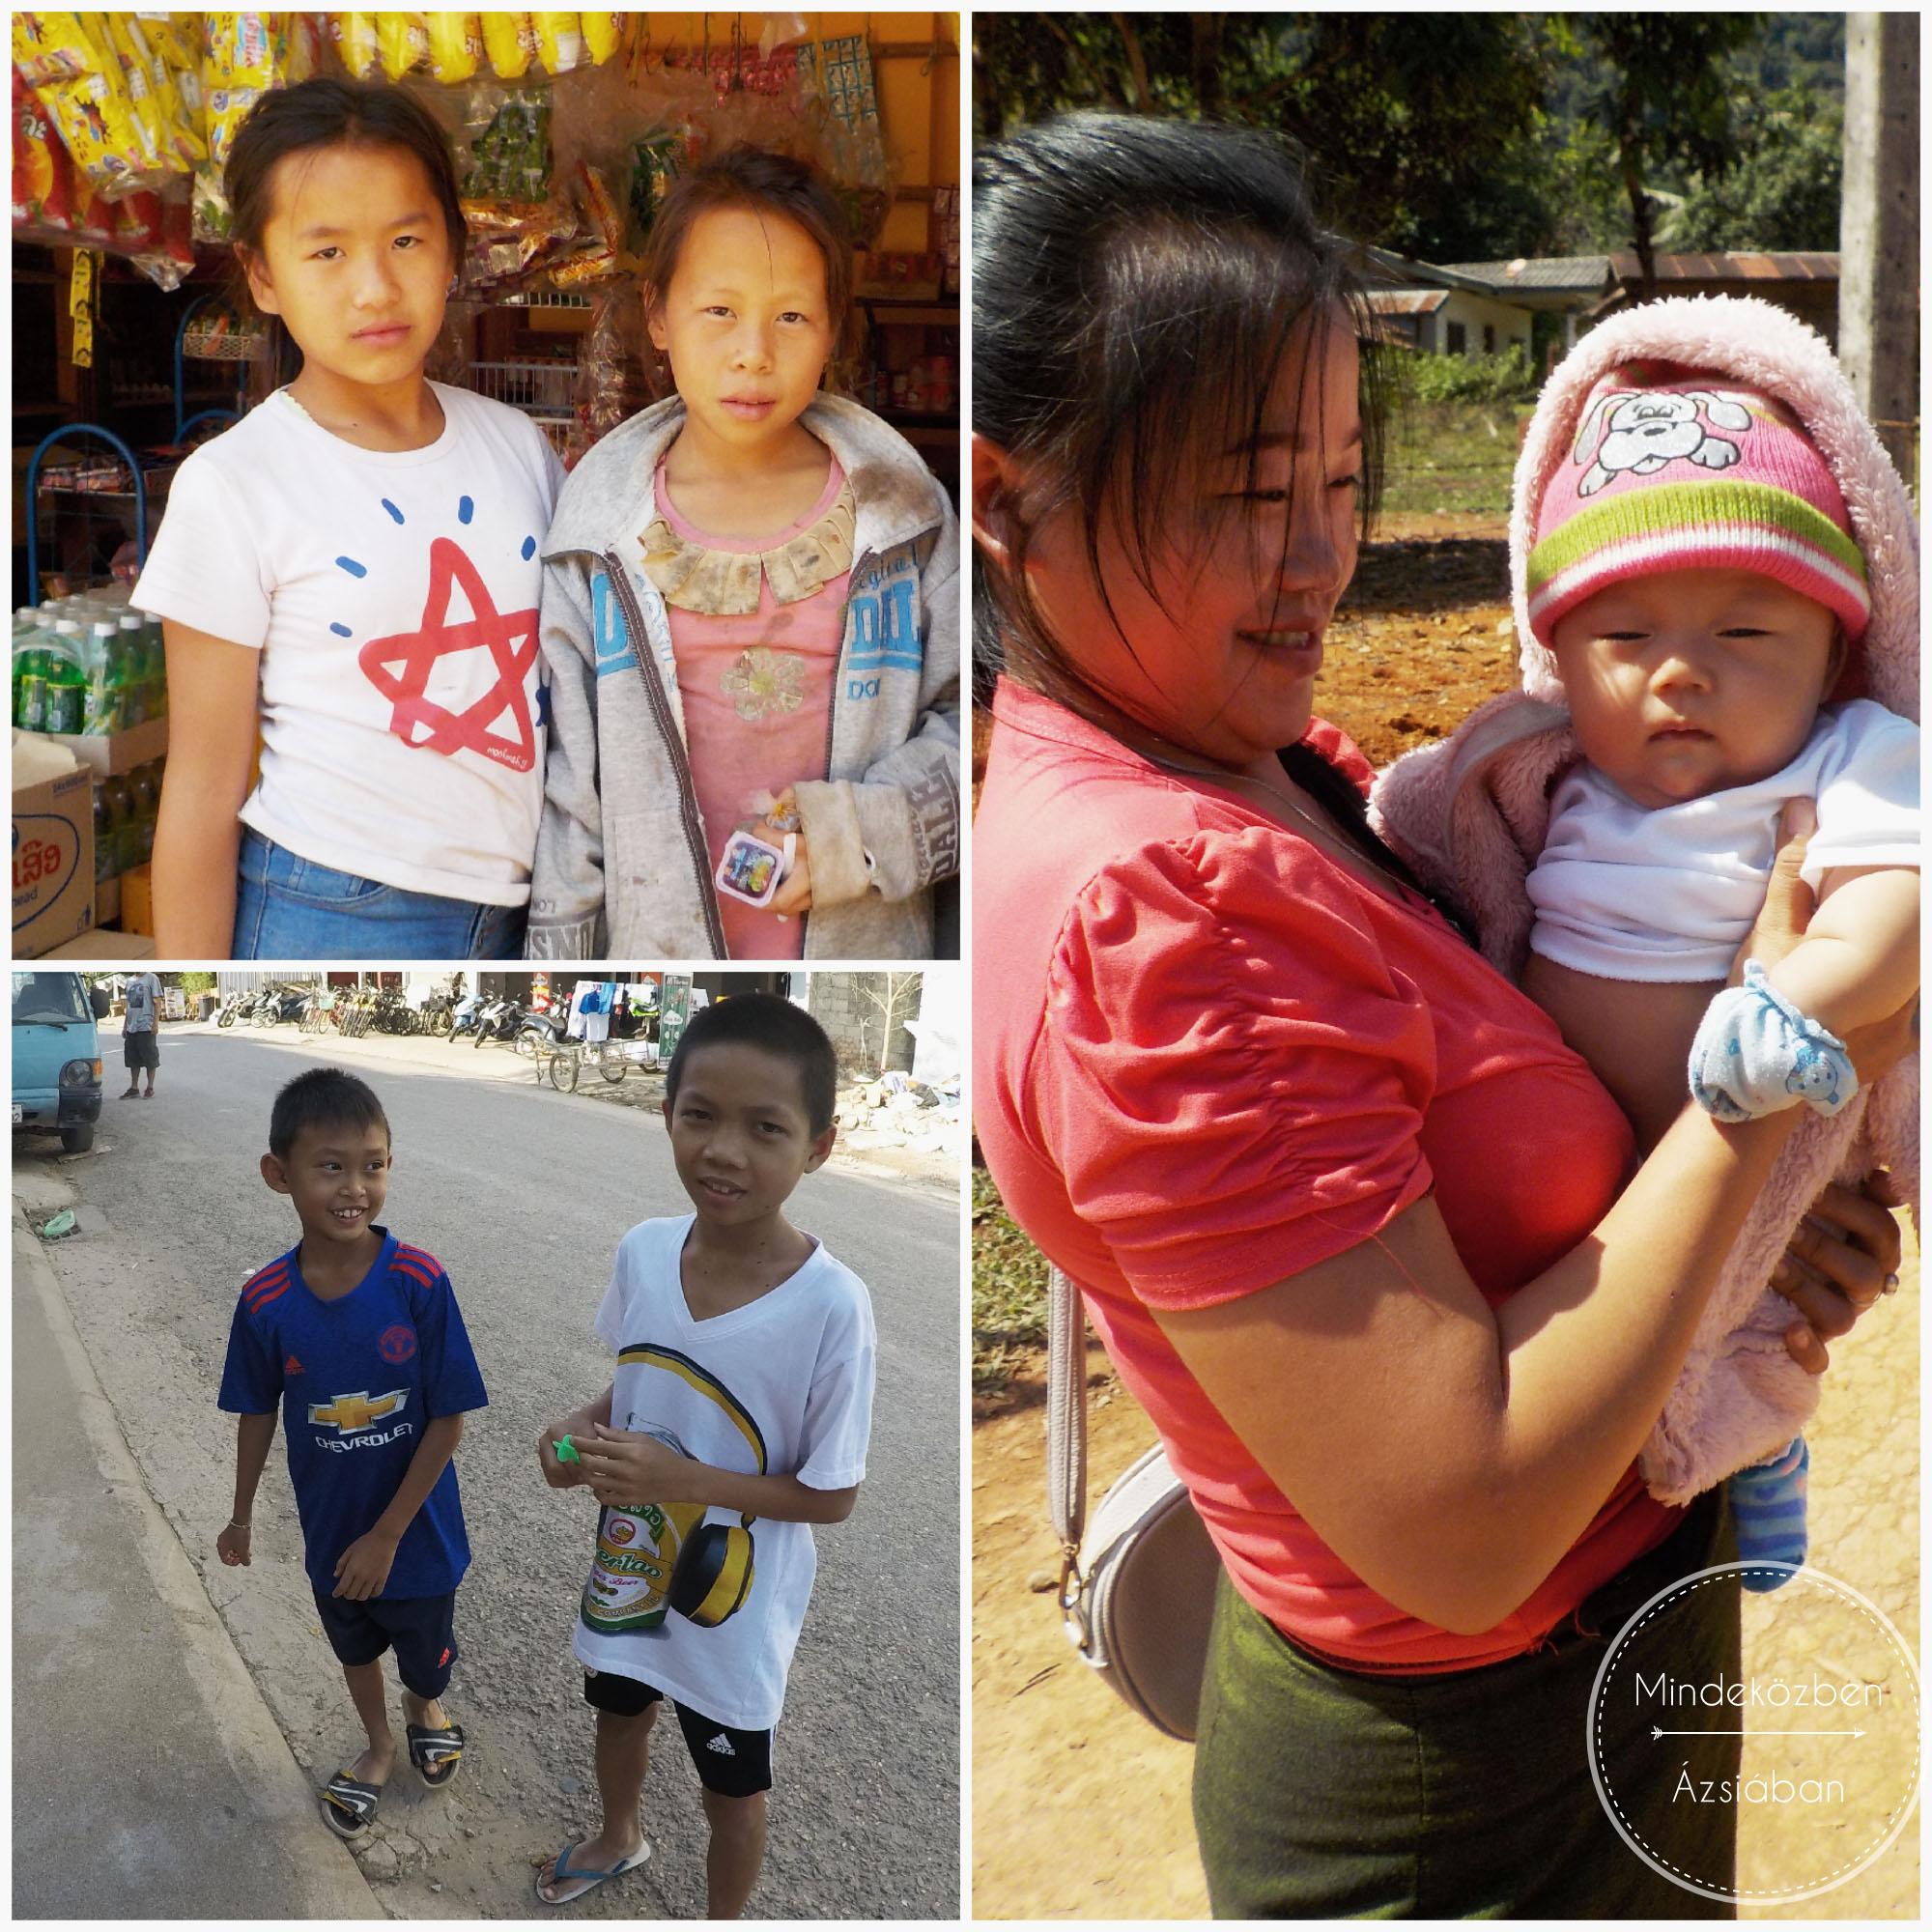 Laoszban annyira kedves mindenki!